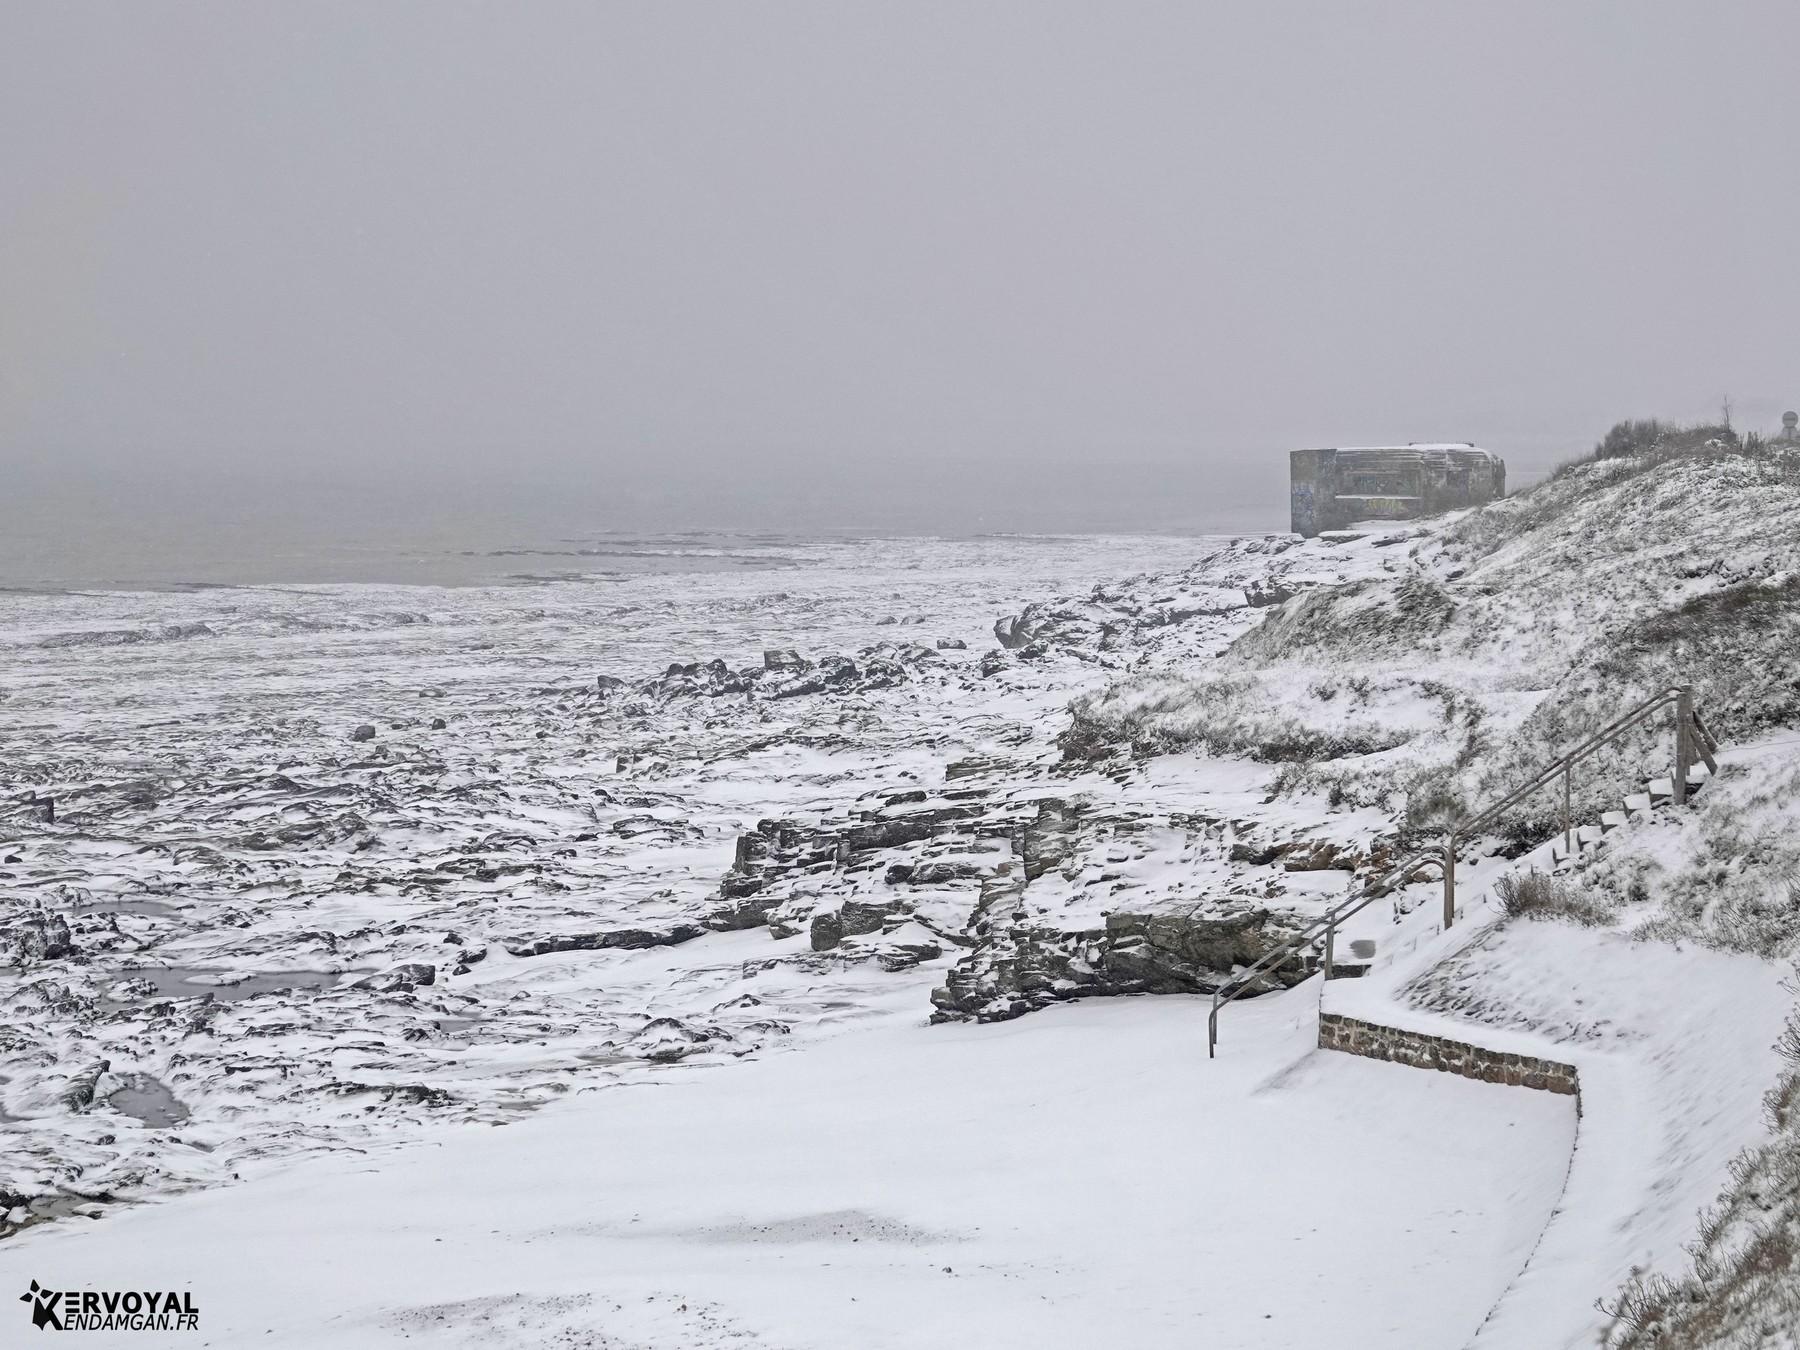 neige à kervoyal 11 février 2021 damgan morbihan (41)